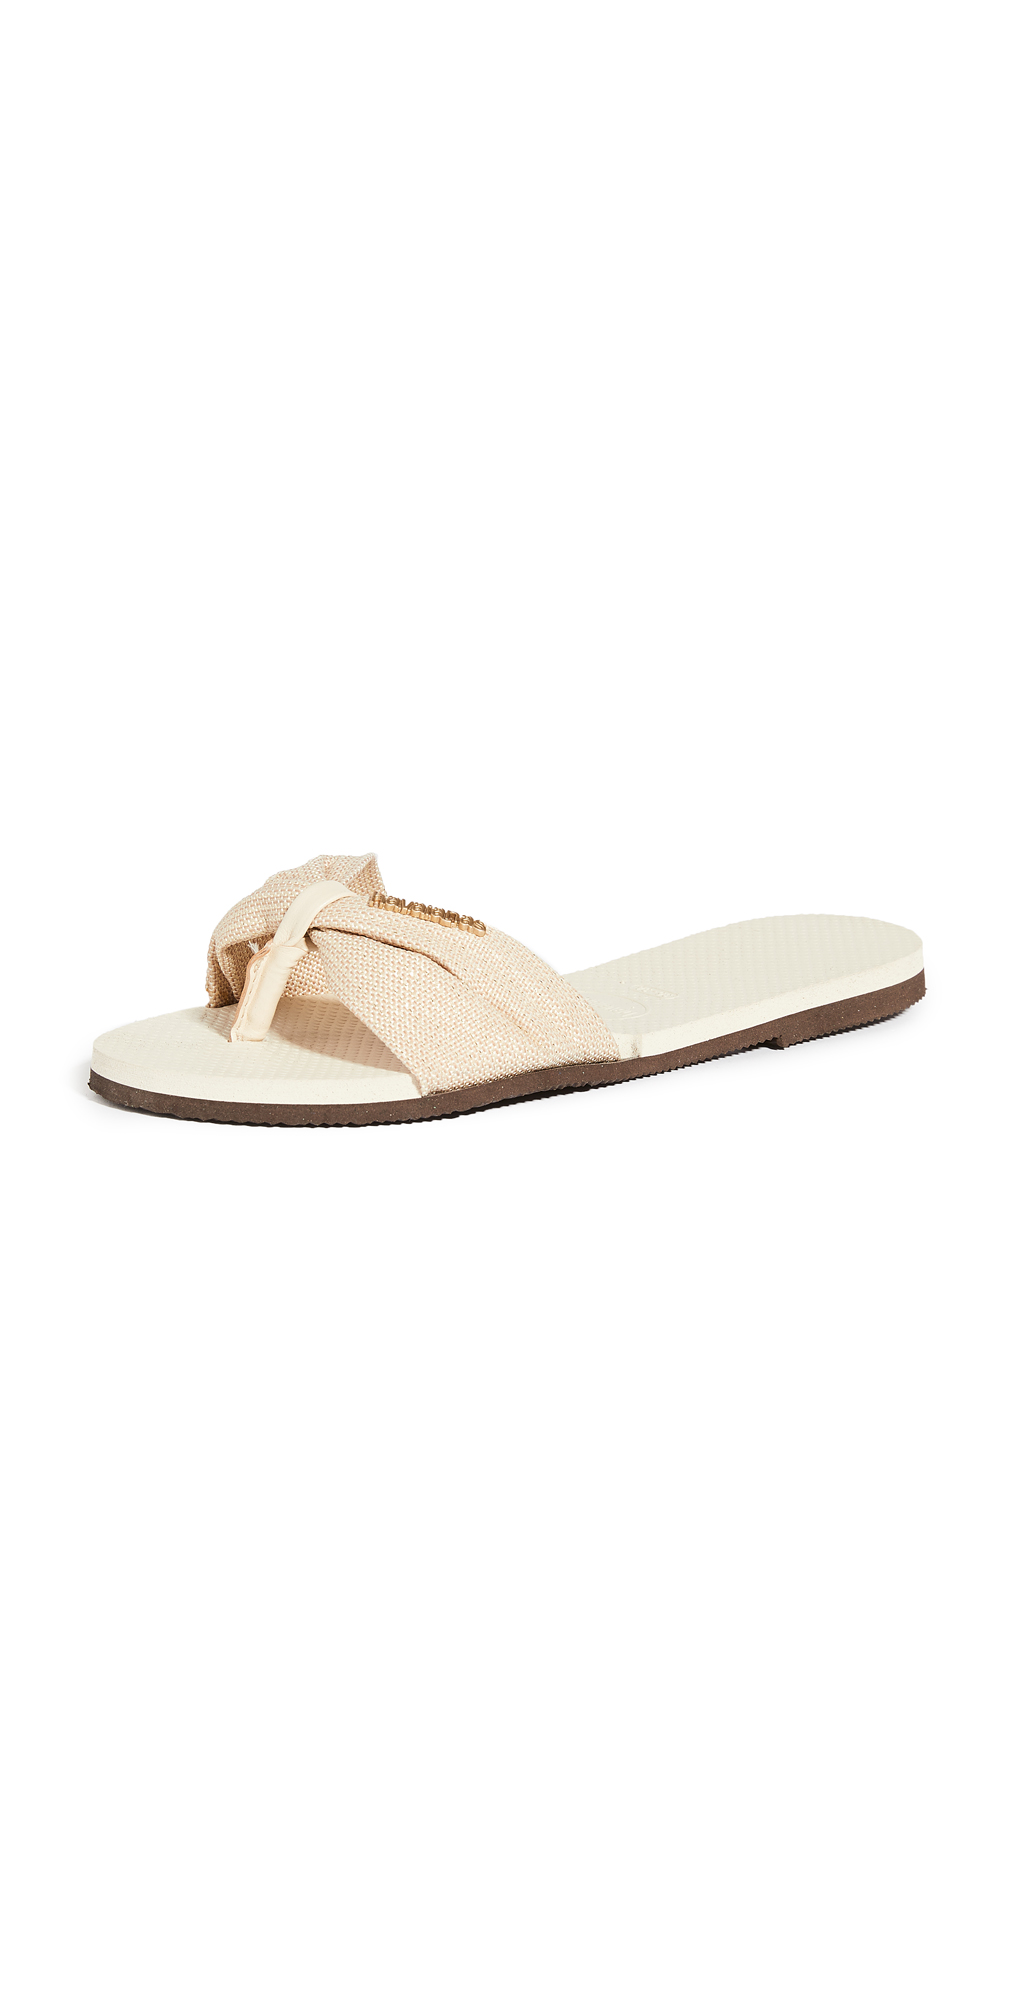 Havaianas You St. Tropez Shine Flip Flops